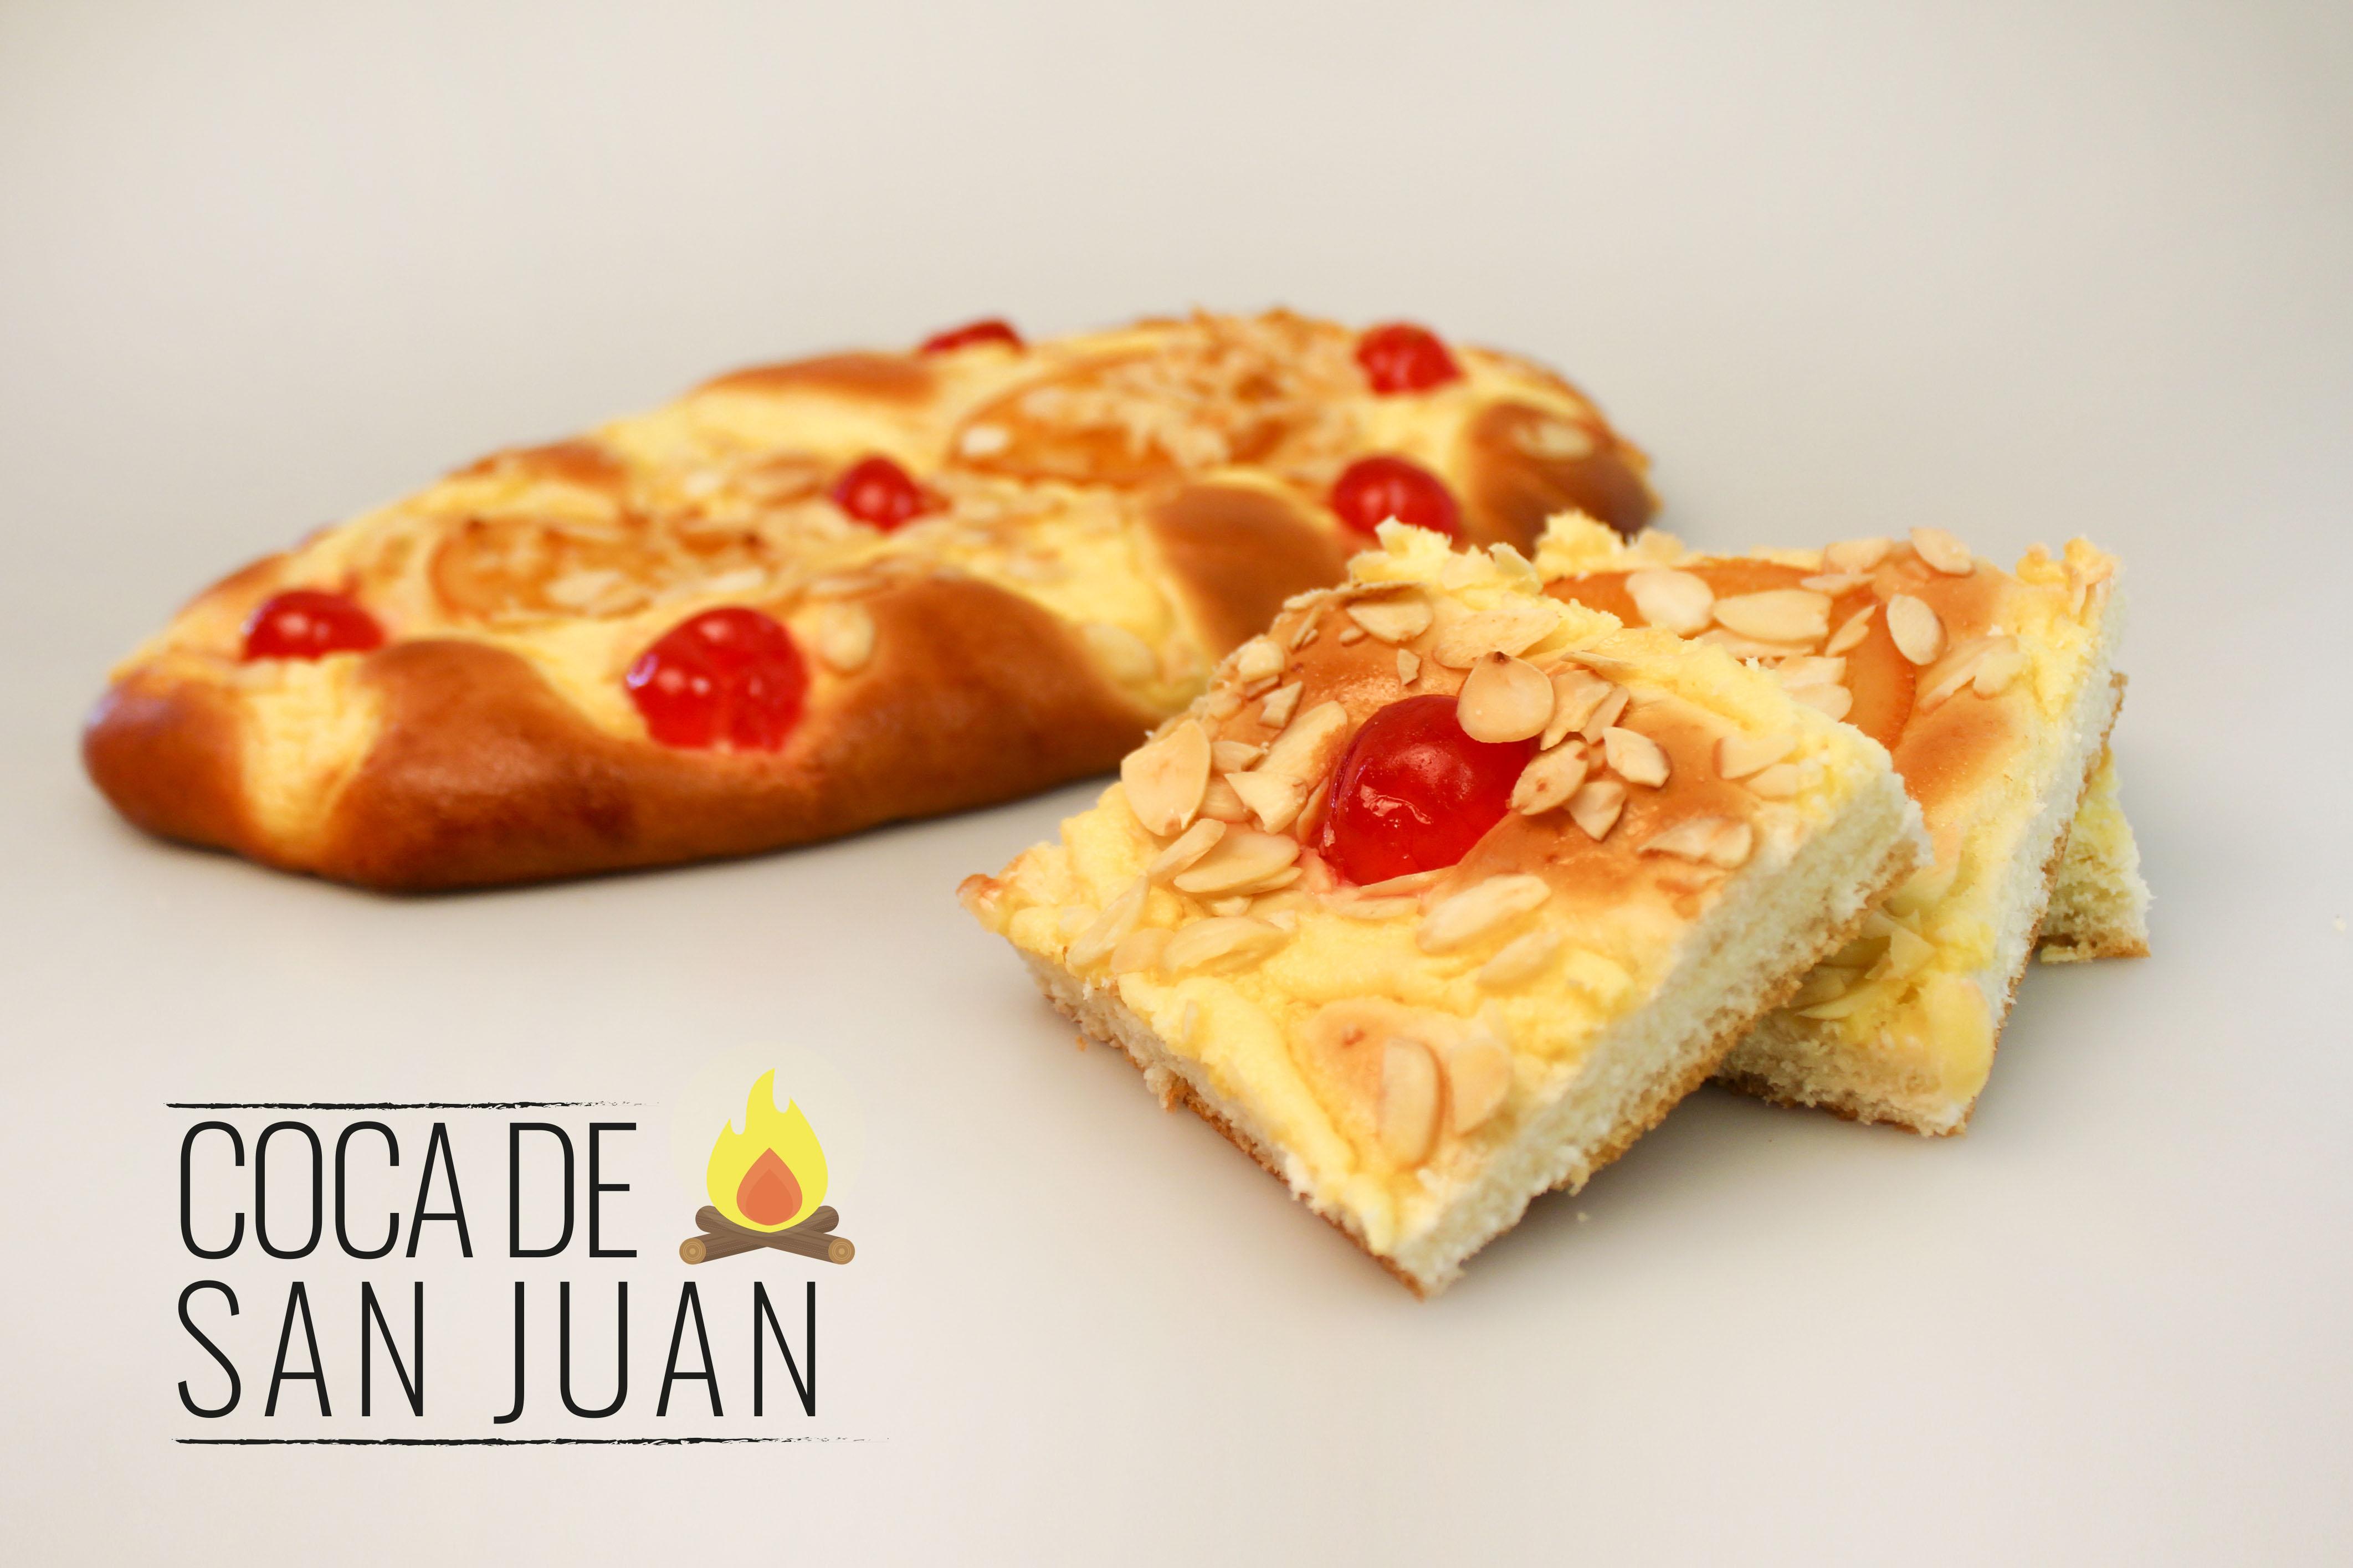 Dulce coca de San Juan elabroada por Panishop